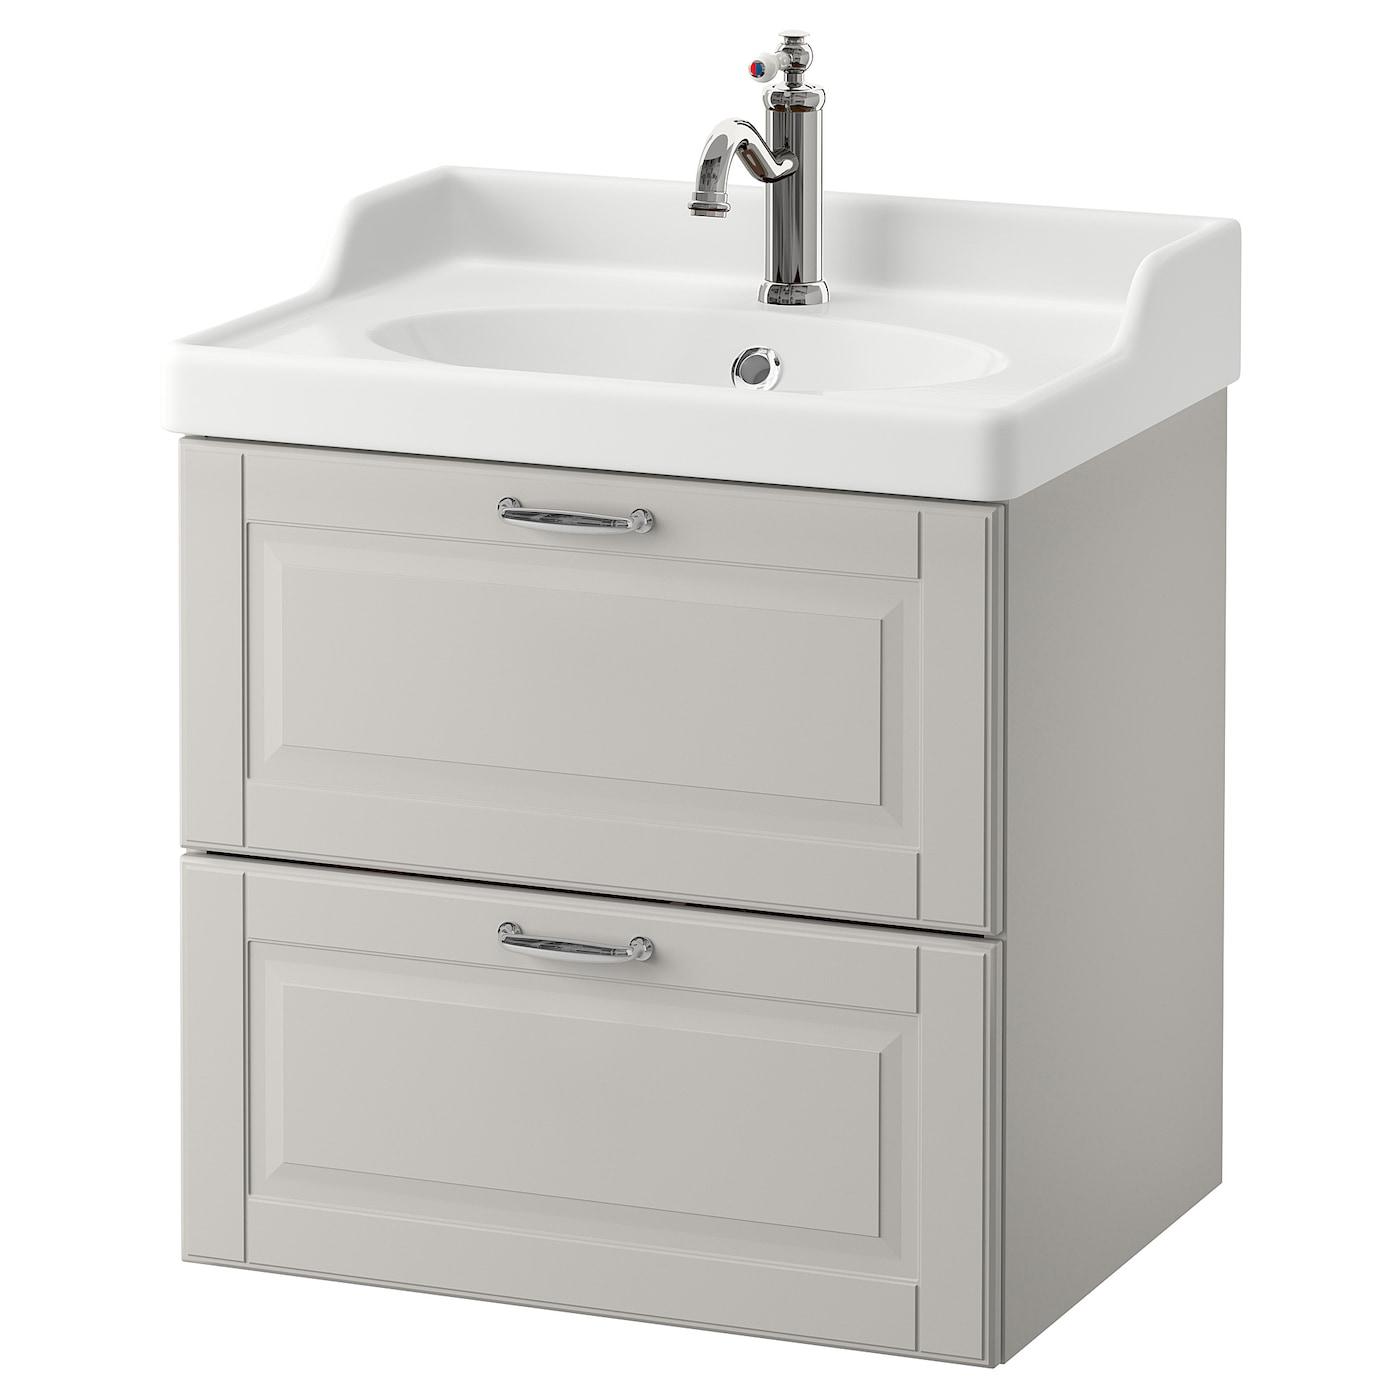 godmorgon r ttviken meuble lavabo 2tir kasj n gris clair 60x49x68 cm ikea. Black Bedroom Furniture Sets. Home Design Ideas